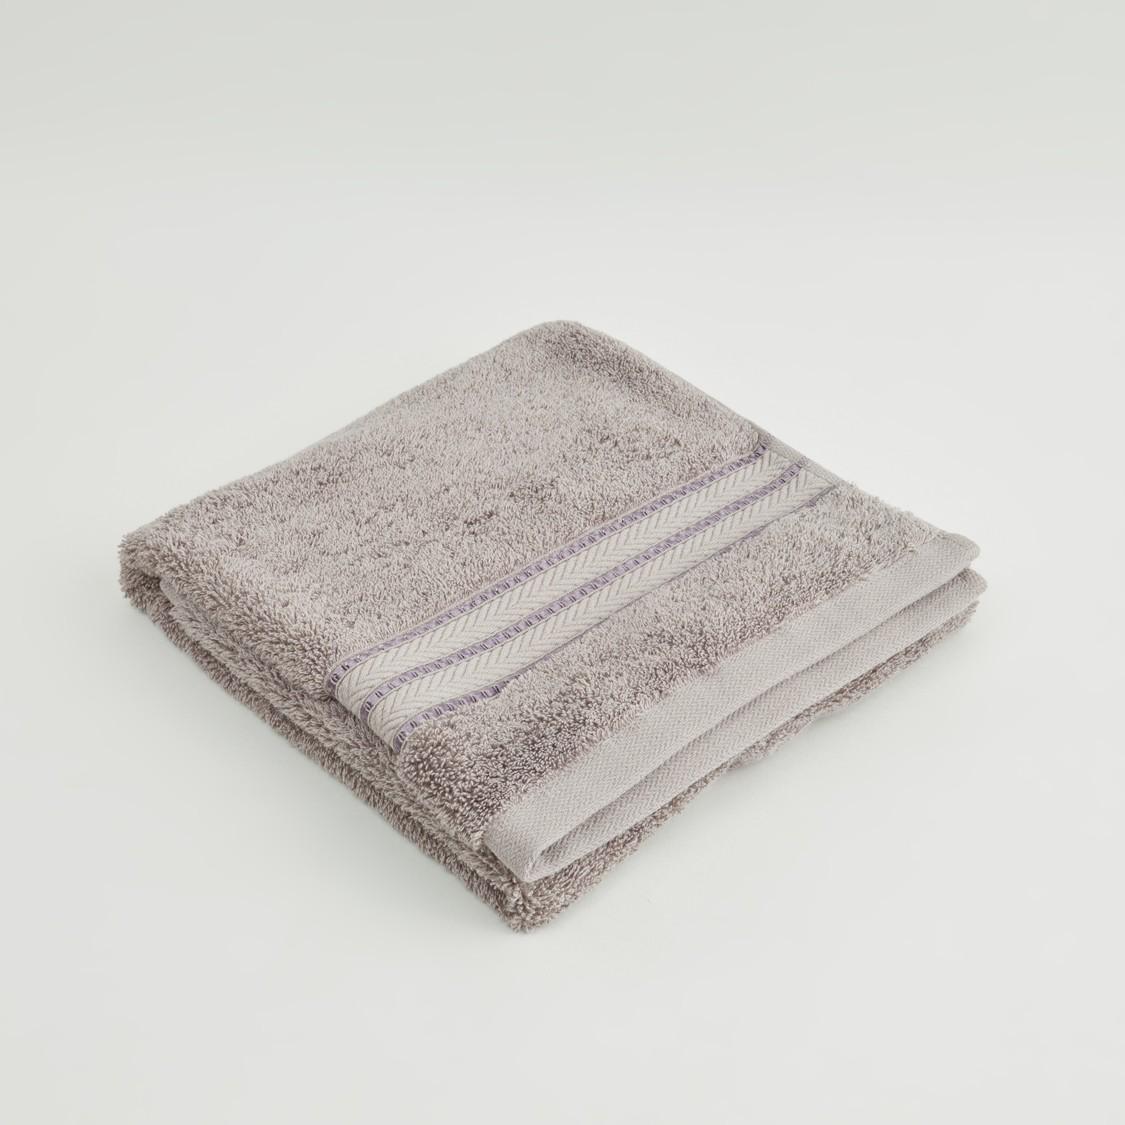 Textured Egyptian Cotton Hand Towel - 80x50 cms